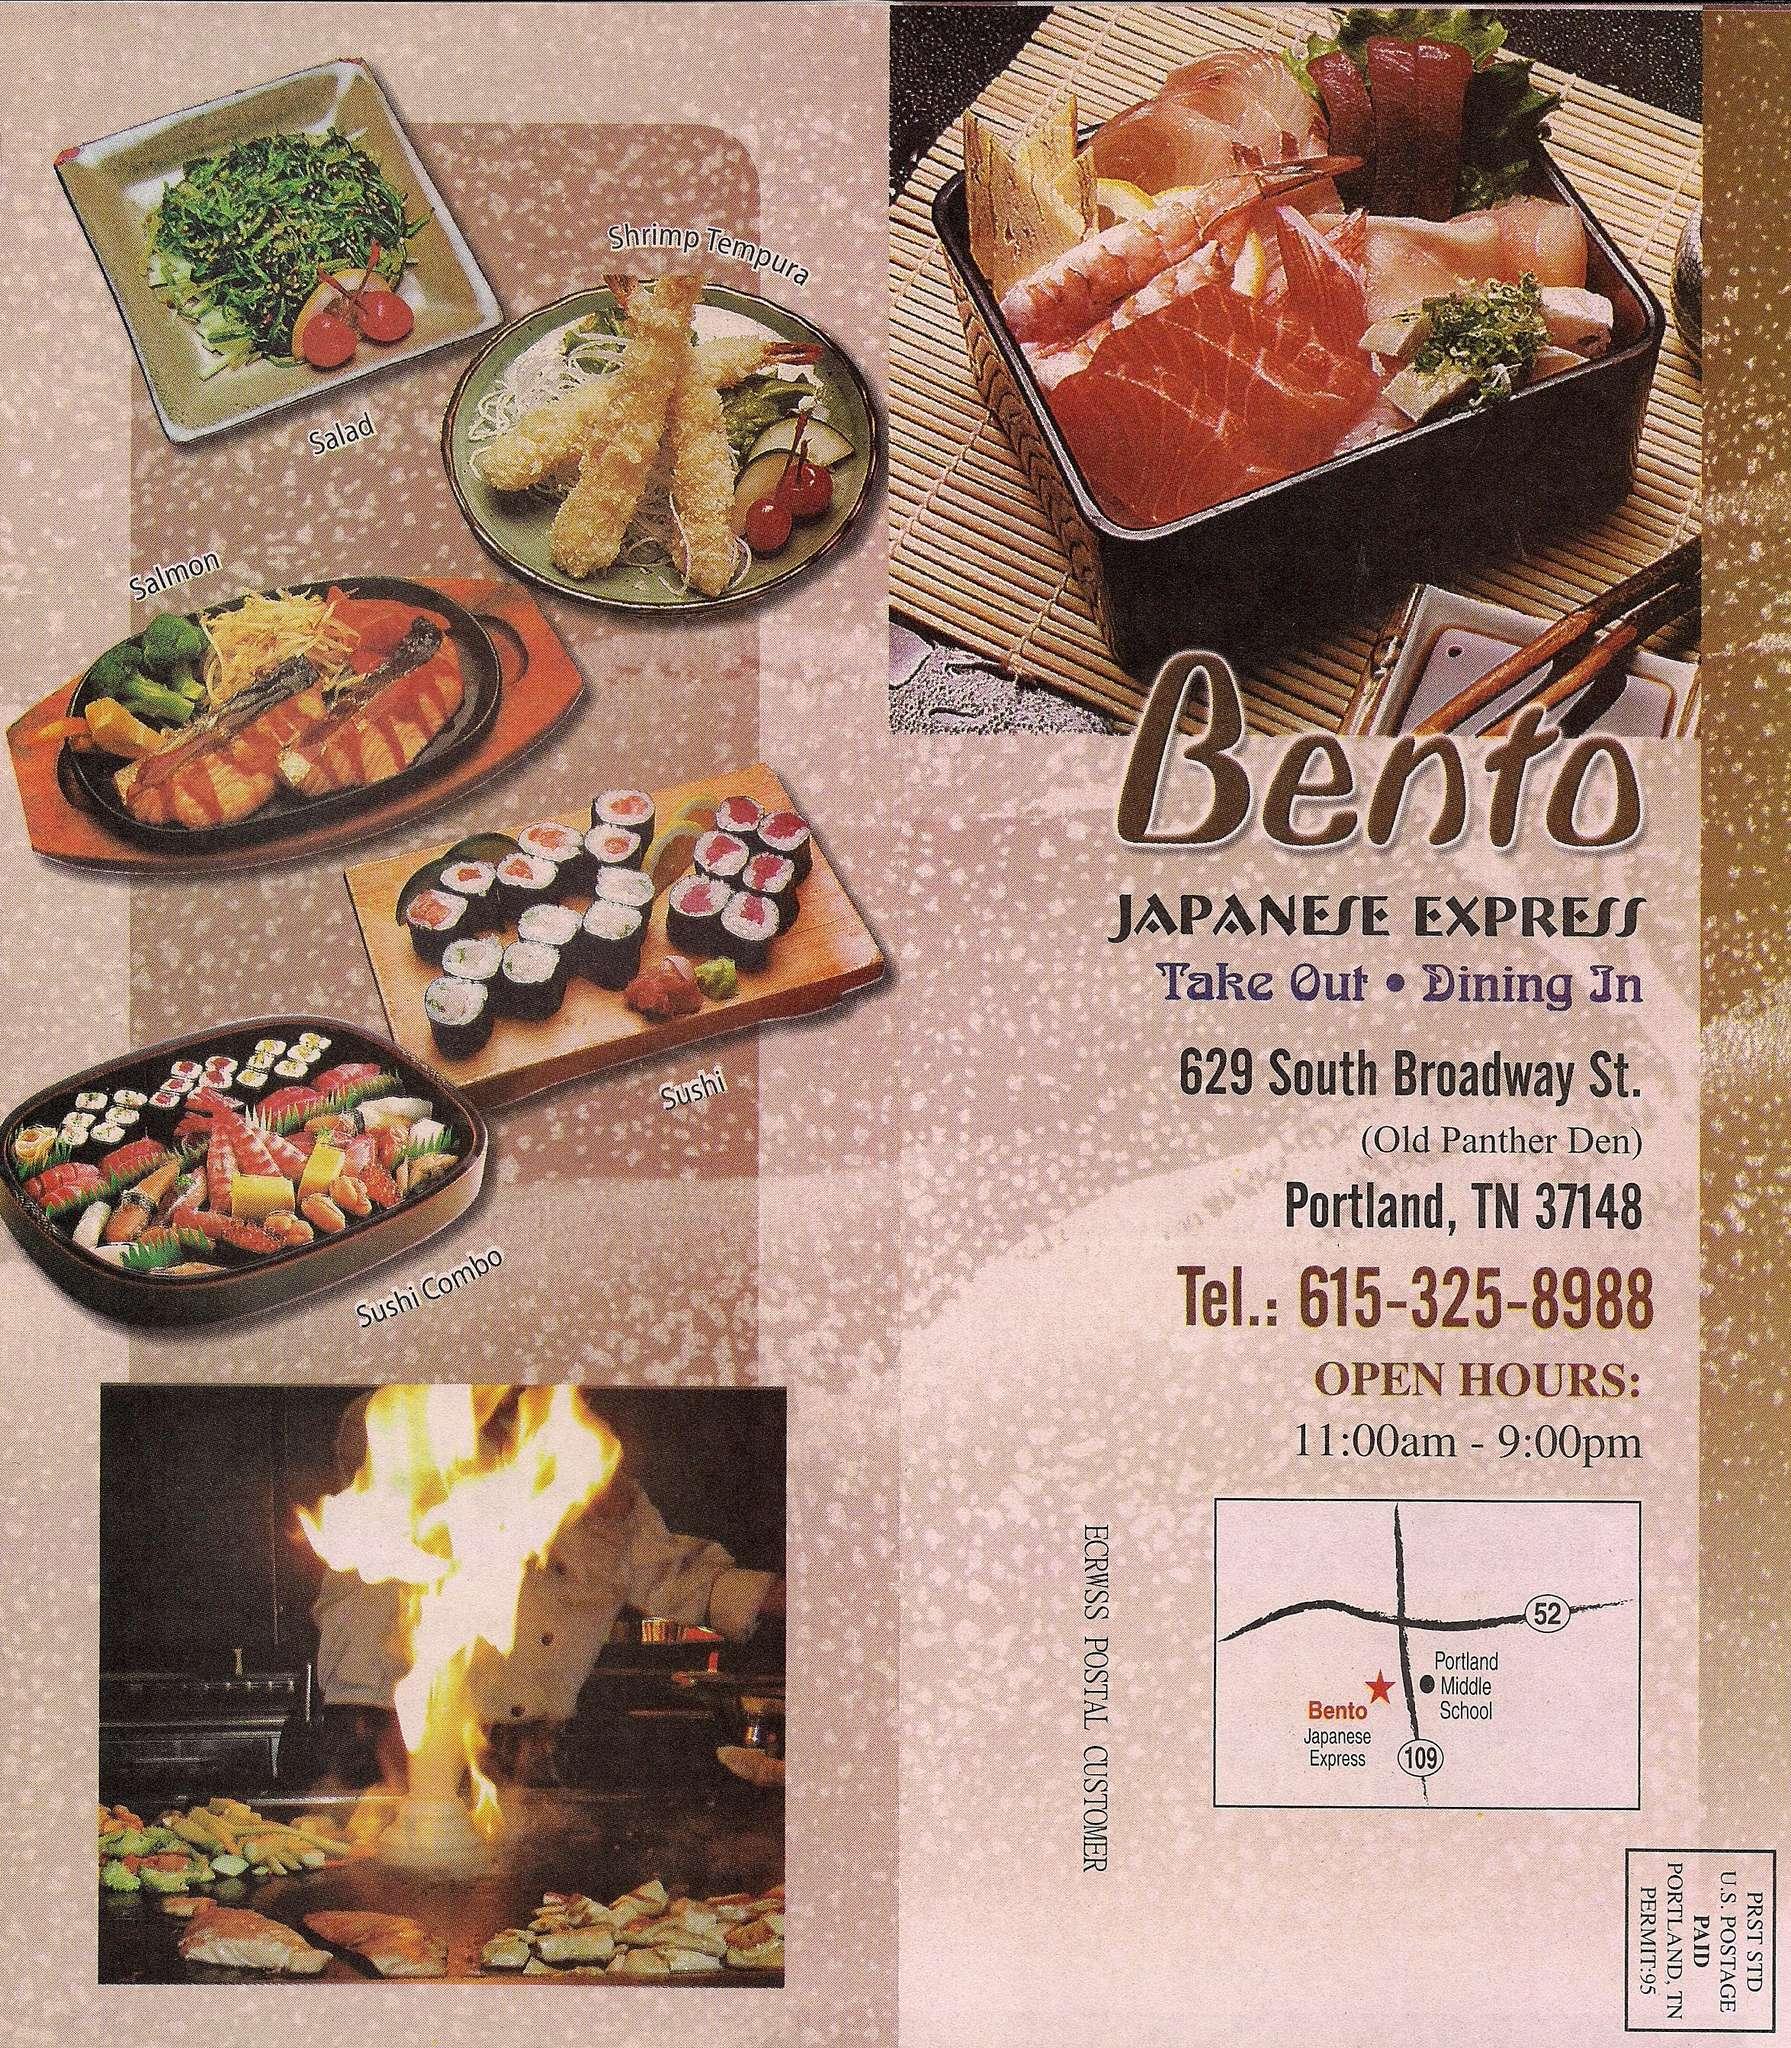 Bento Japanese Express Menu Menu For Bento Japanese Express